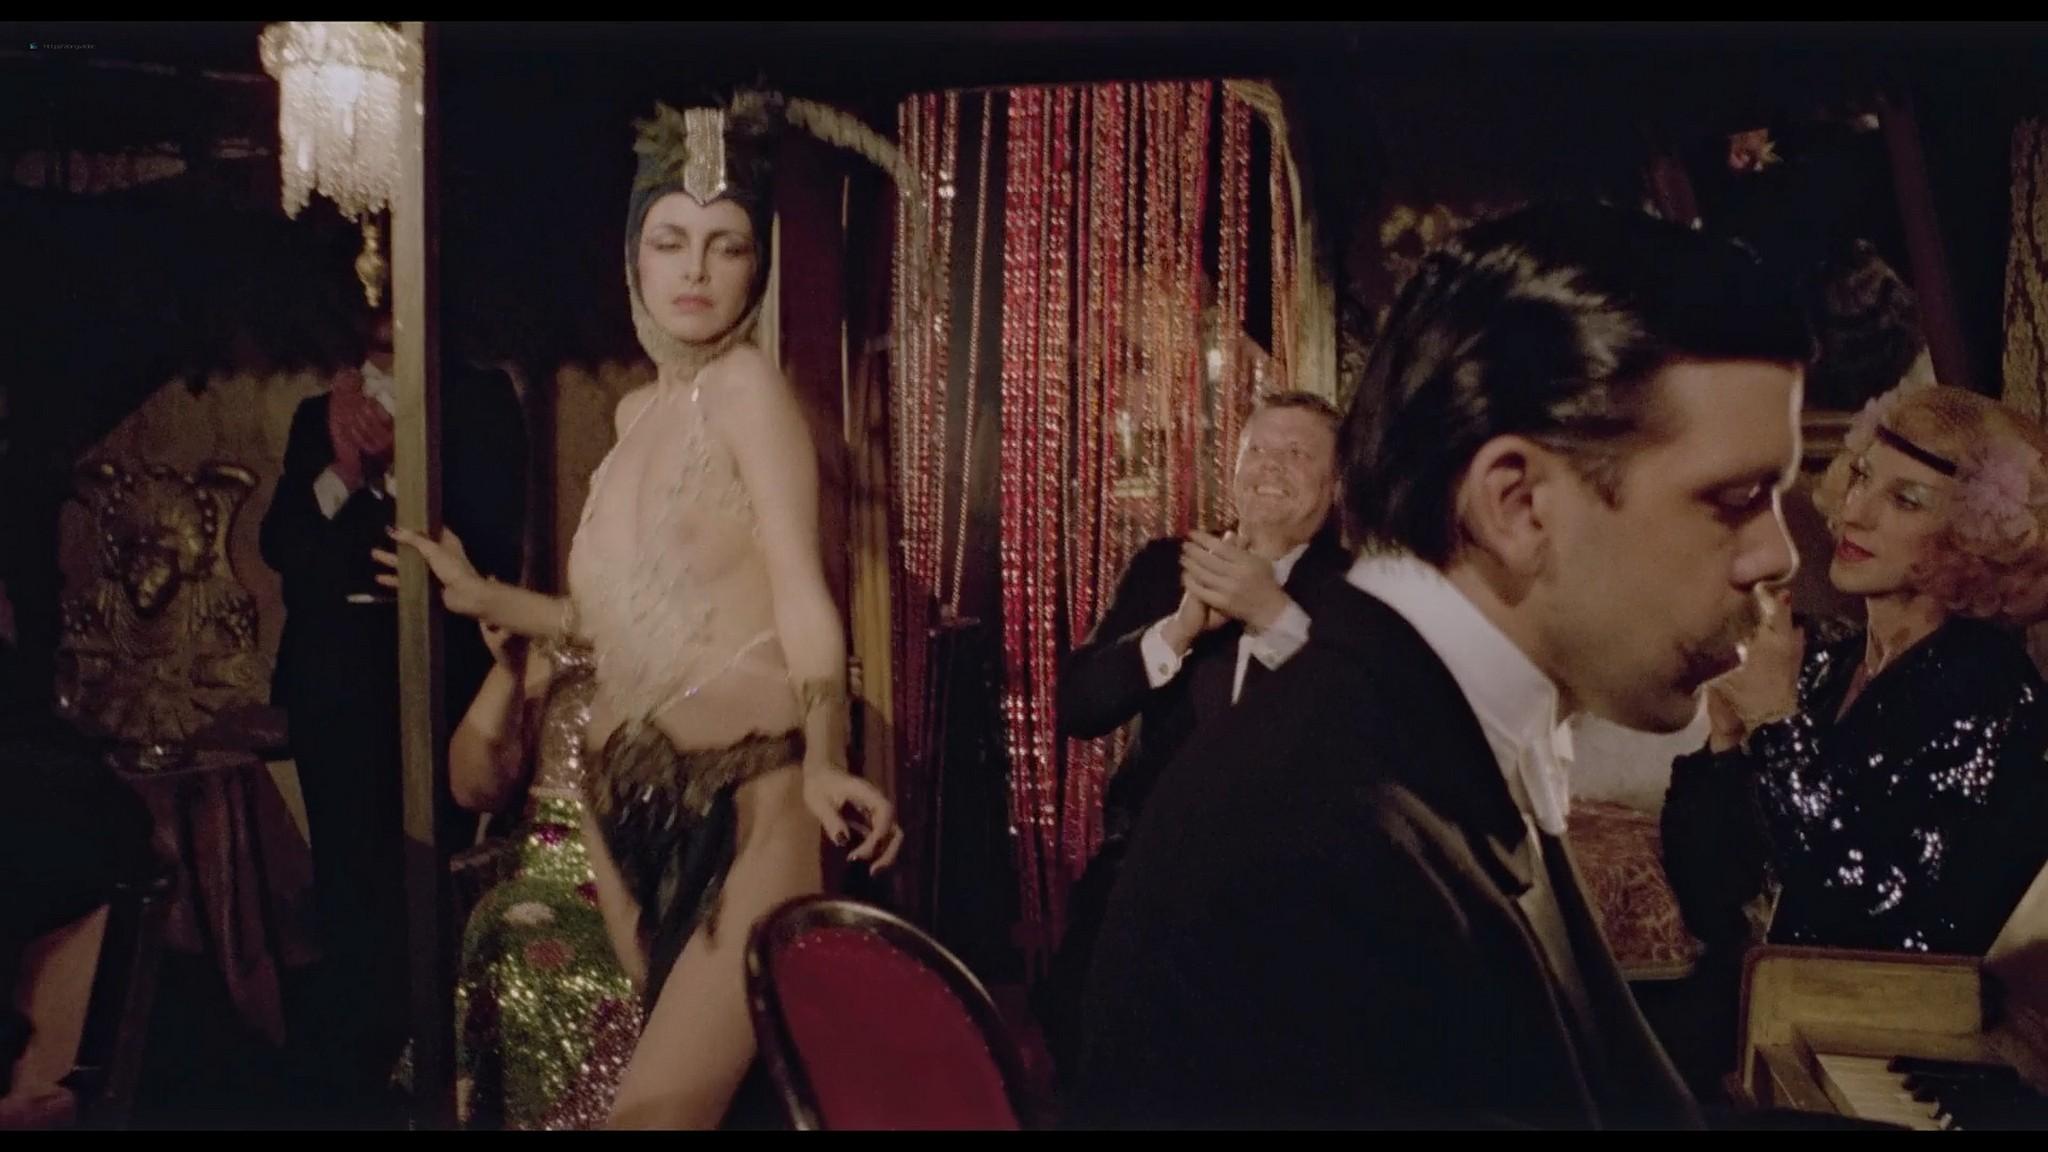 Sydne Rome hot see through and sexy Just a Gigolo 1978 1080p BluRay 6